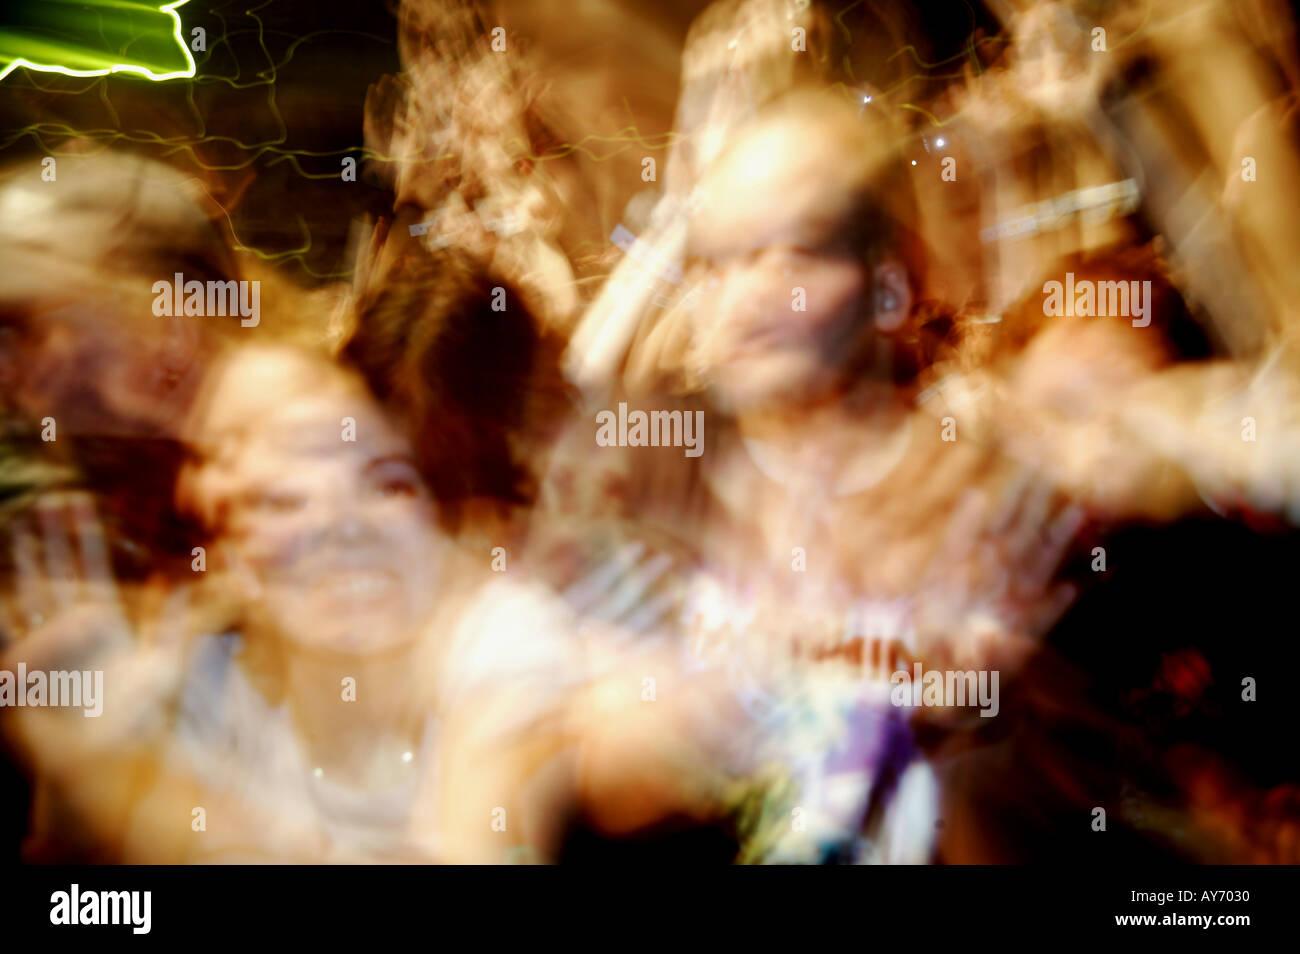 concert crowd 02 - Stock Image